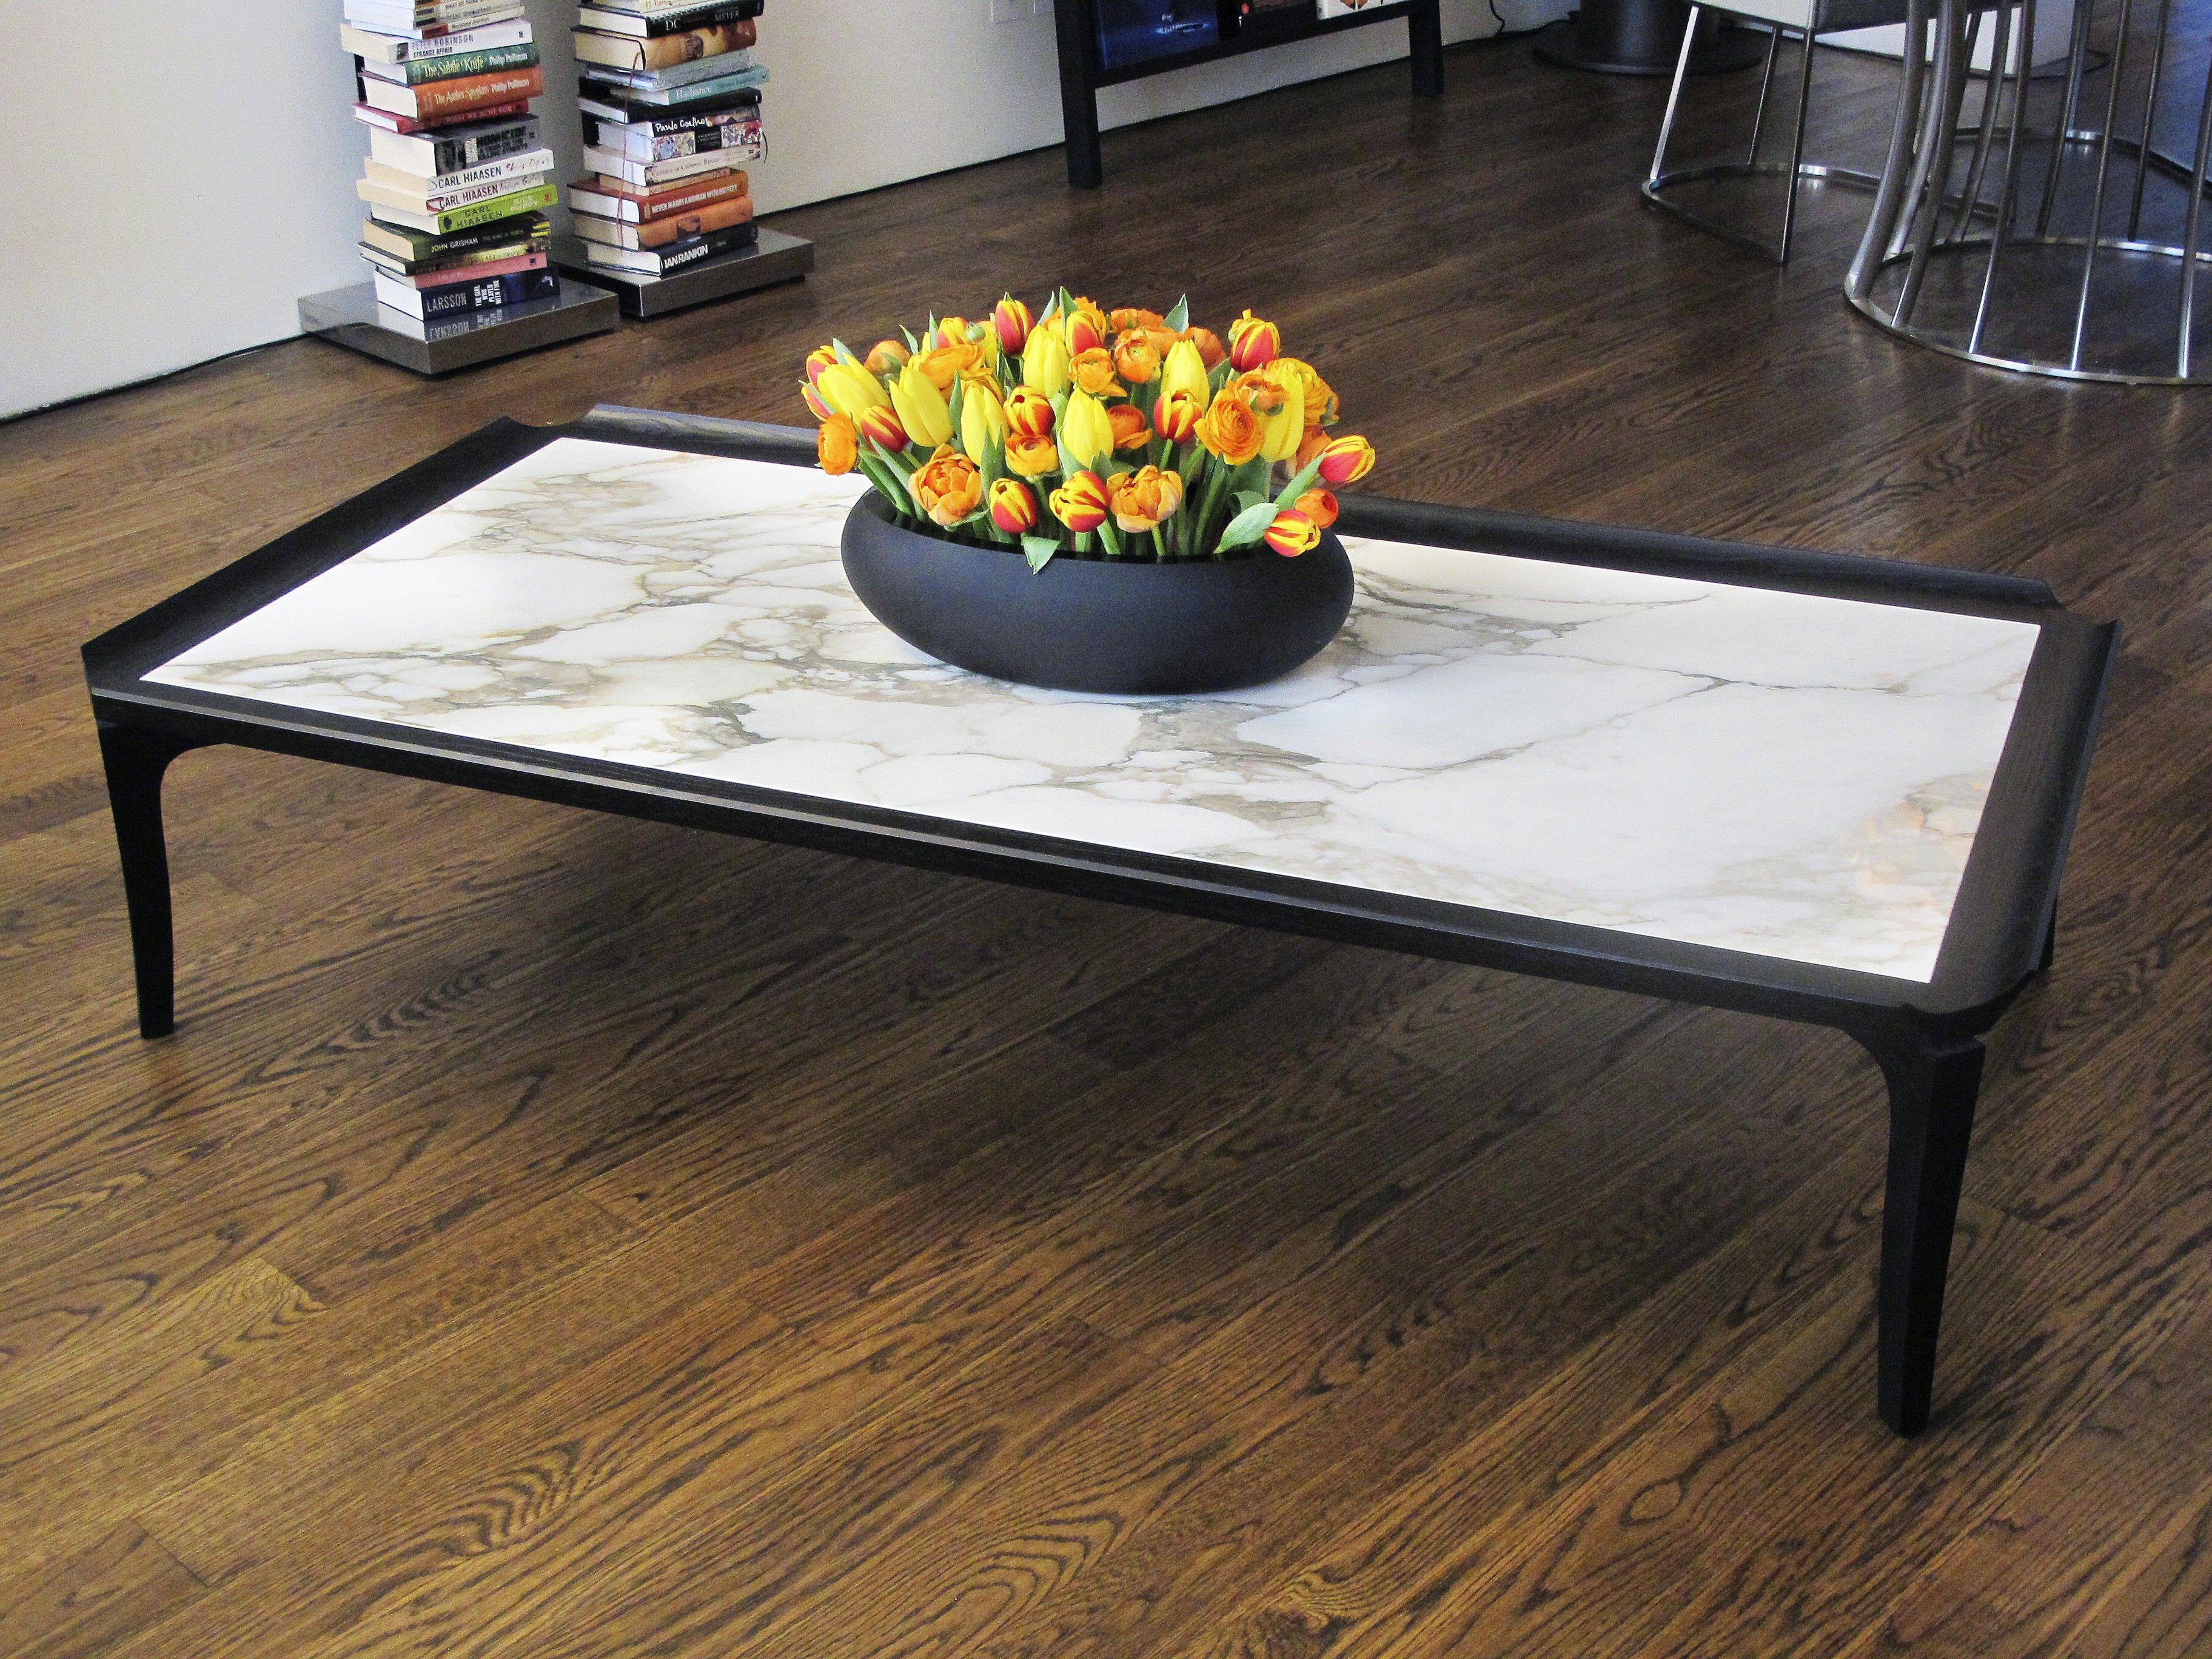 MOOD Shogun Coffee Table:  An elegant rectangular low #coffeetable from renowned Italian furniture makers #flexform. #luxuryfurniture #livingroomdesign